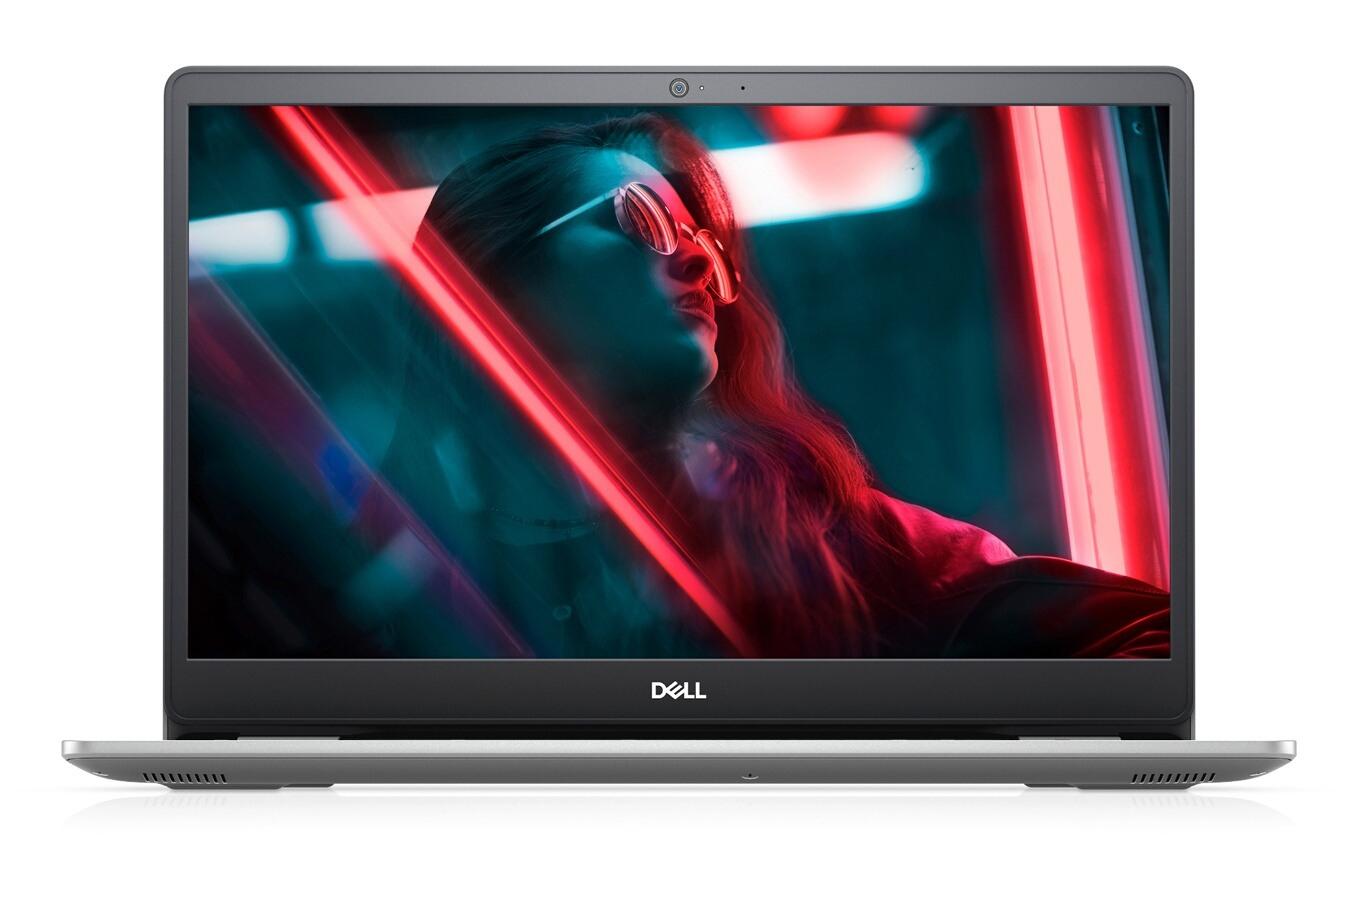 "PC Portable 15.6"" Dell Inspiron 15 5593 - Full HD, i7-1065G7, 16 Go RAM, 512 Go SSD, W10 (Via ODR 50€)"